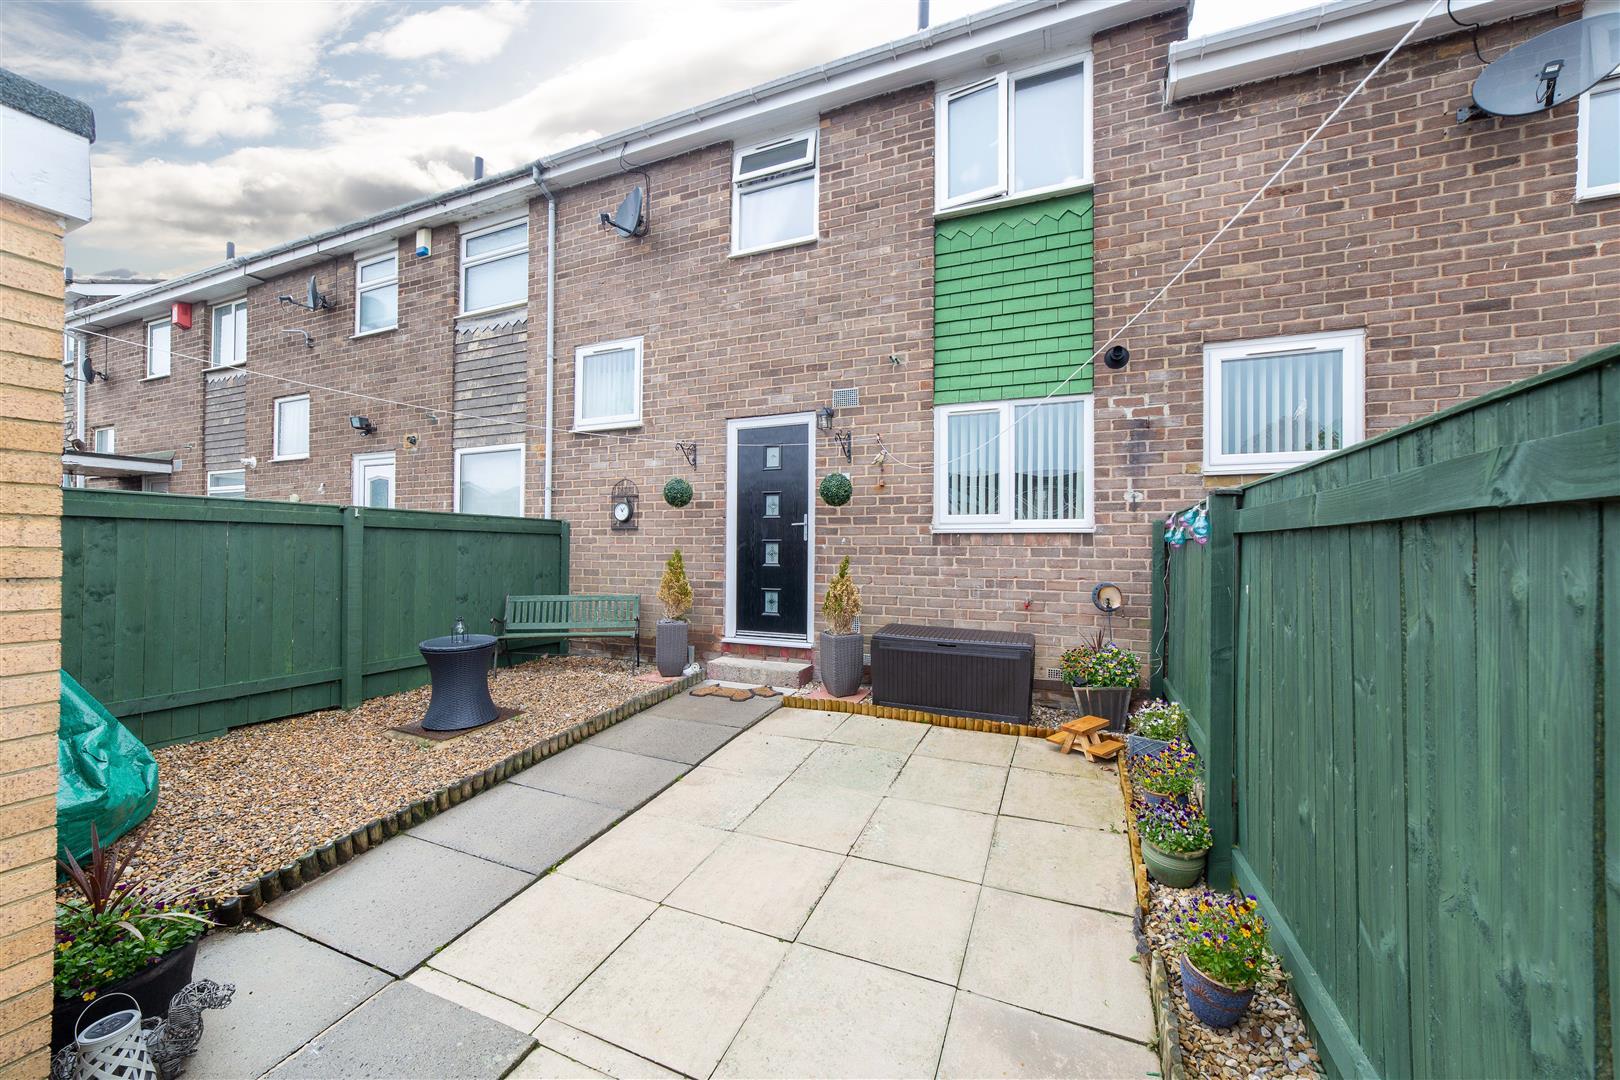 2 bed terraced house for sale in Cramlington, NE23 6JR - Property Image 1